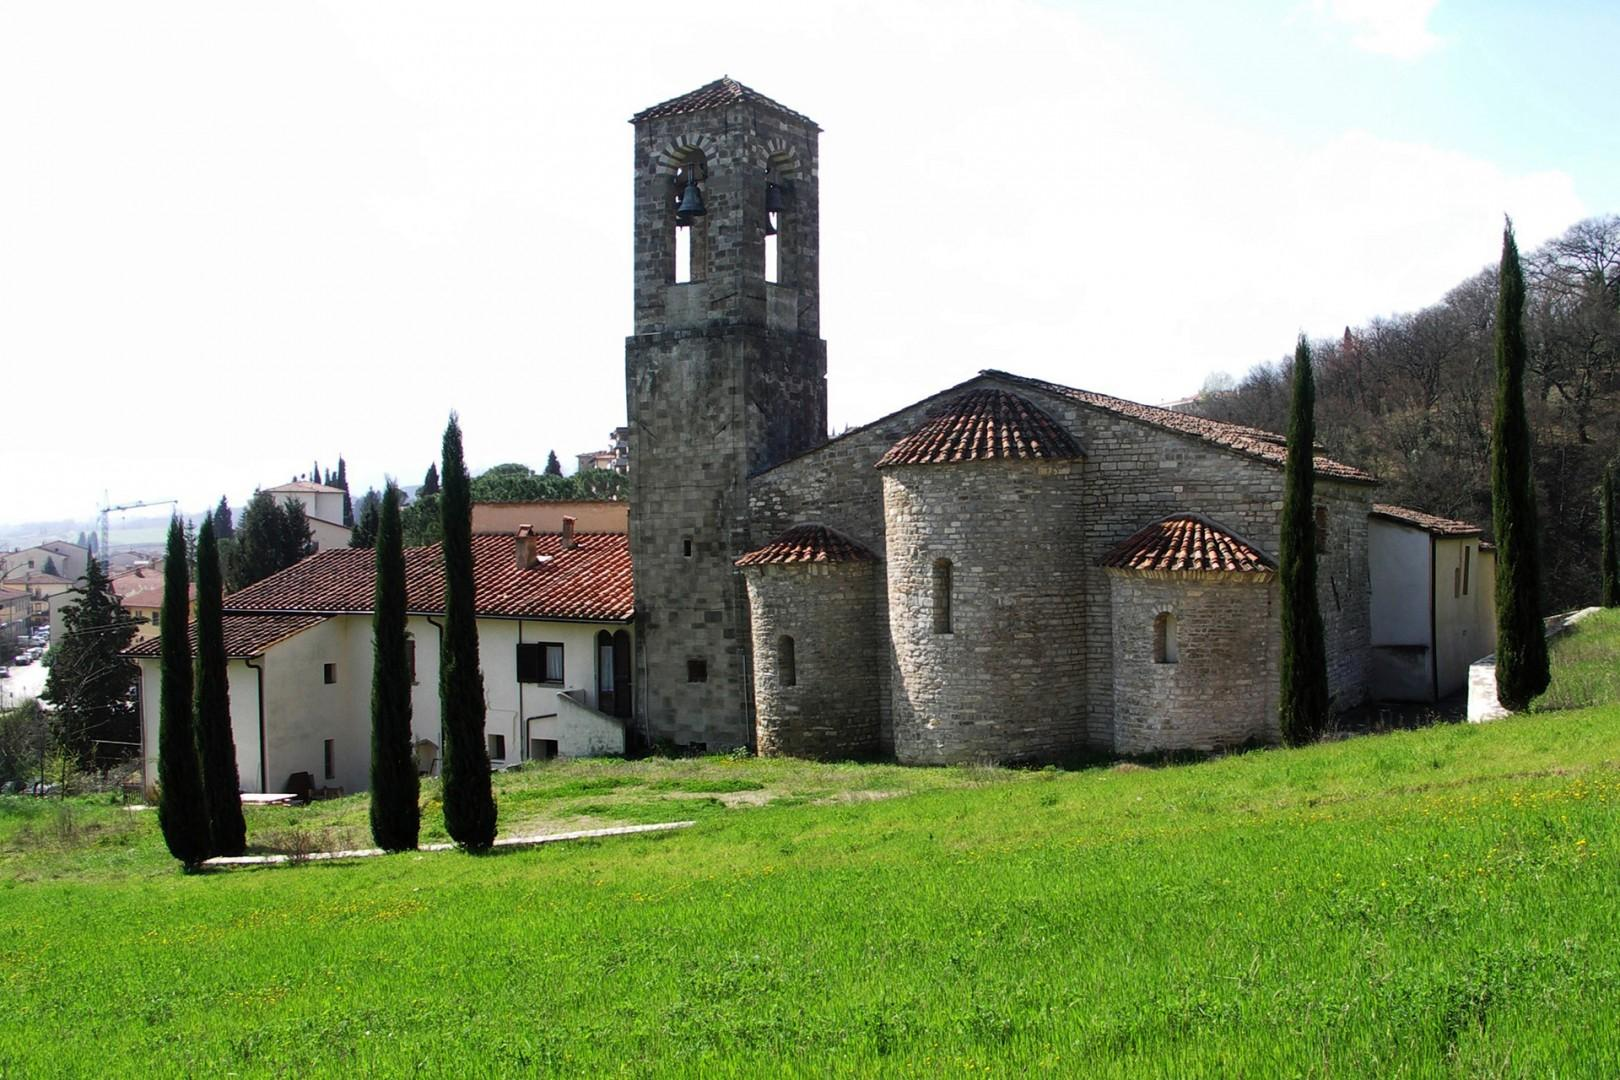 The ancient church of San Leolino in Rignano sull'Arno dates back to 1066.